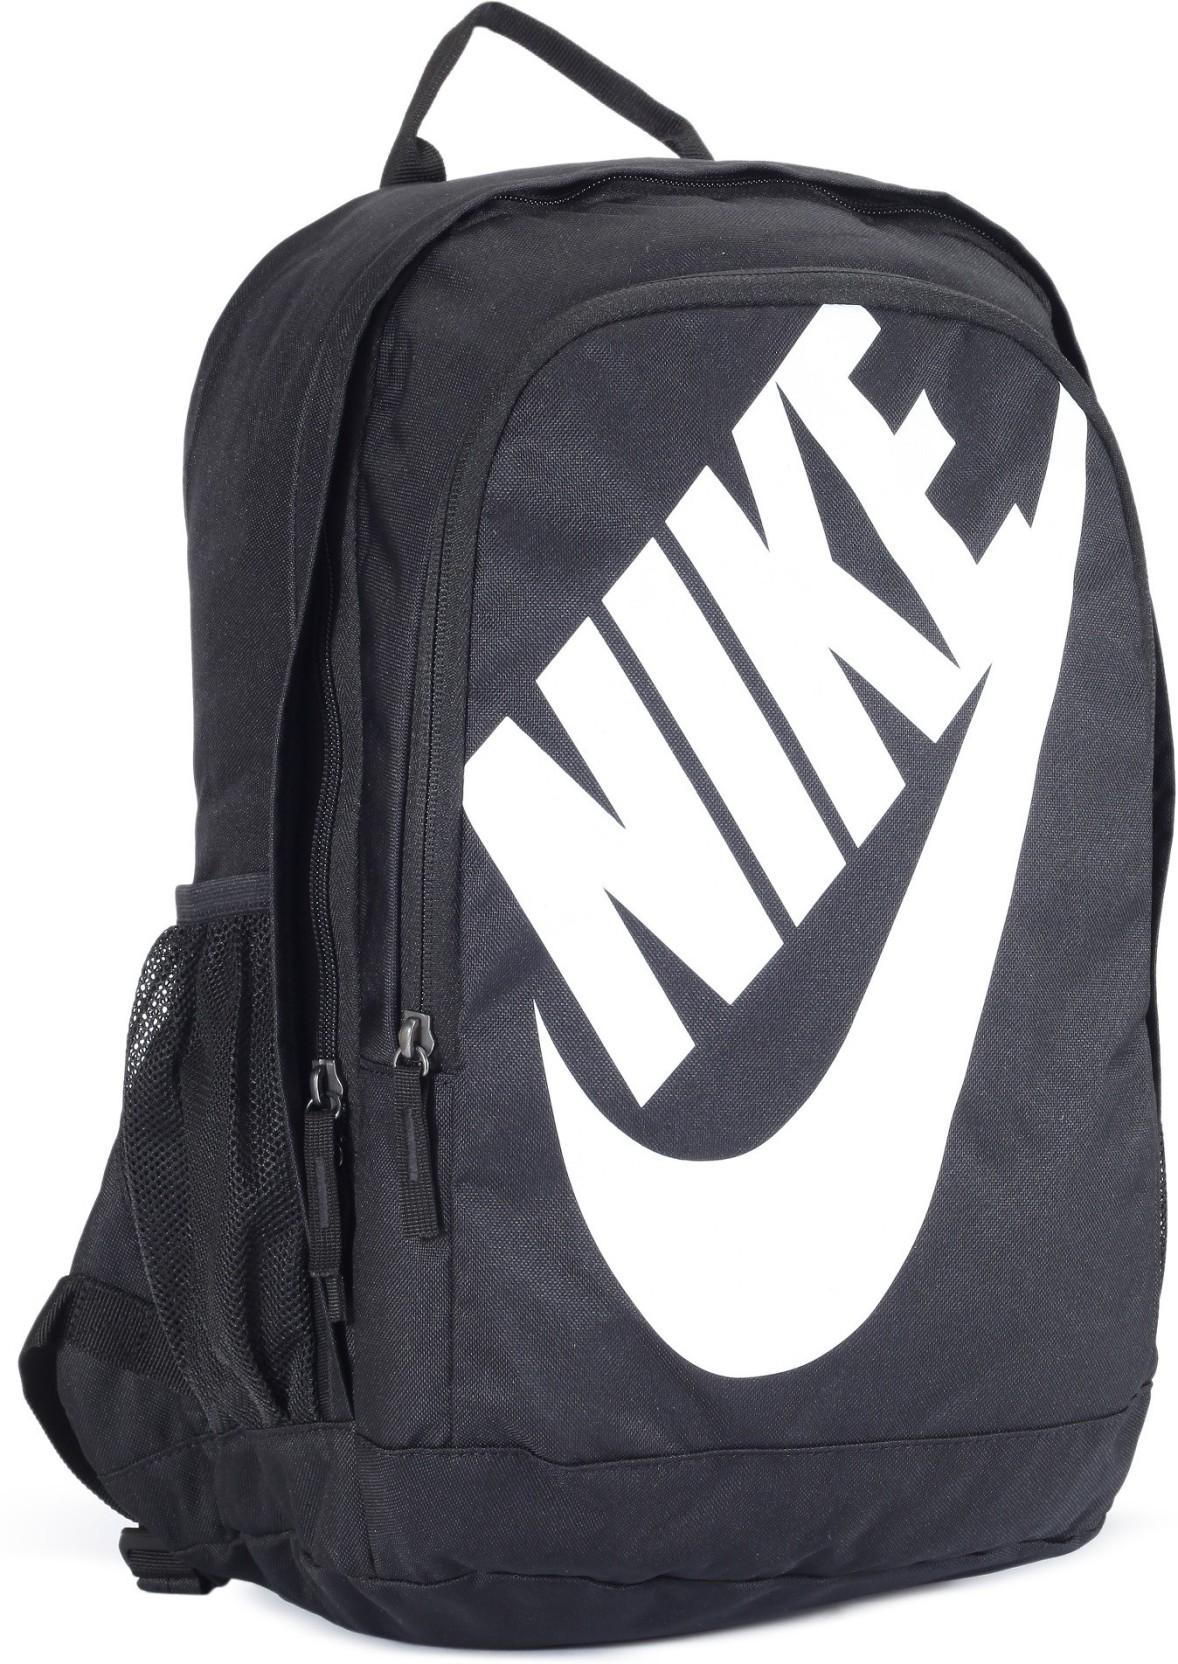 Nike NK Hayward Futura - Solid 25 L Backpack (Black) 7b510caca6d43